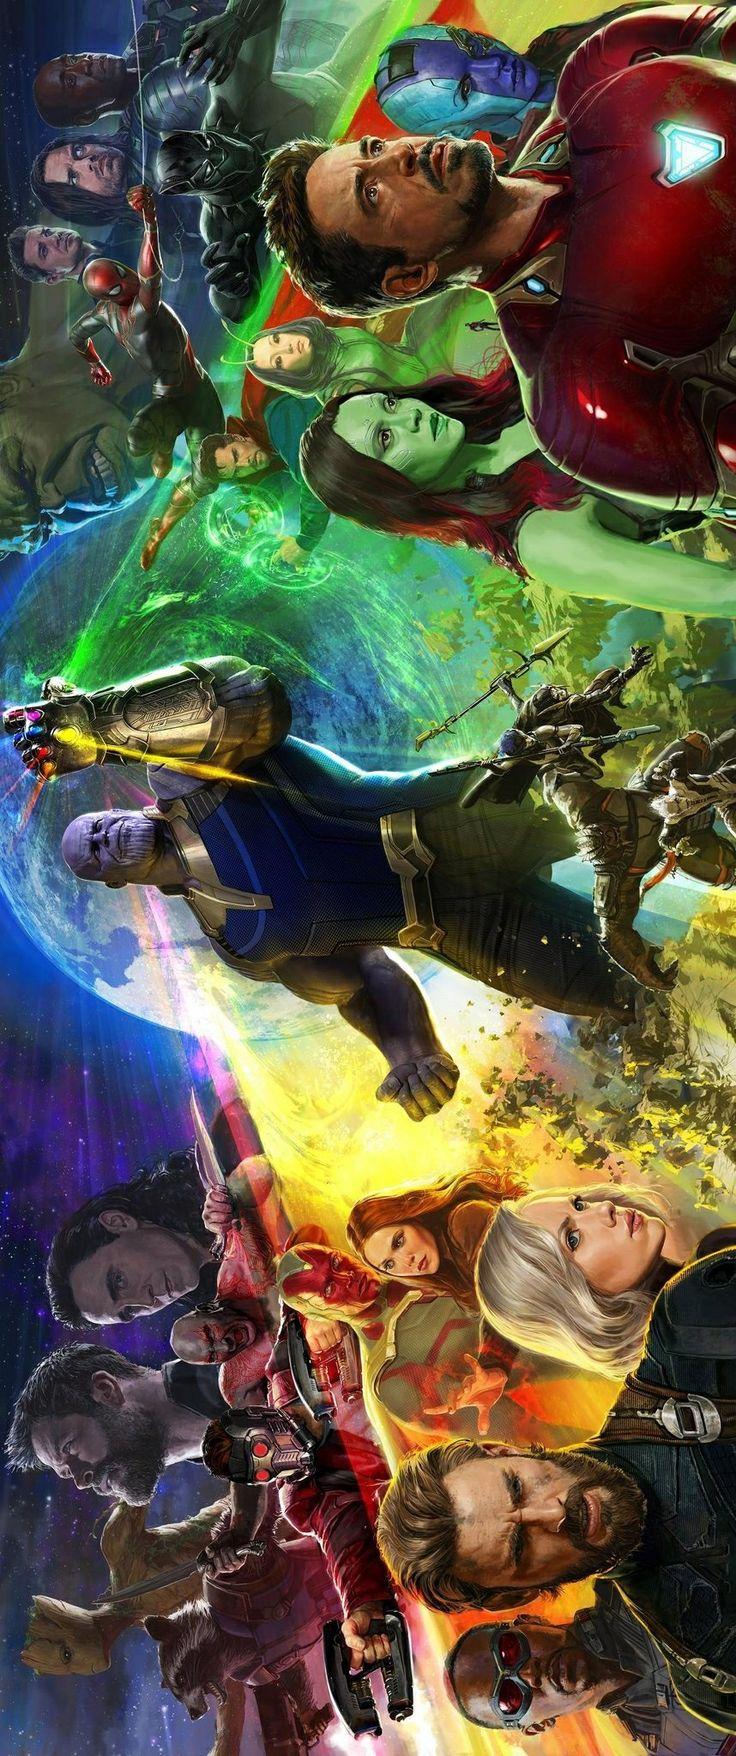 Pôster Guerra Infinita (Infinity War ). Parte 1 (2018) , Parte 2 (2019) Marvel Studios.